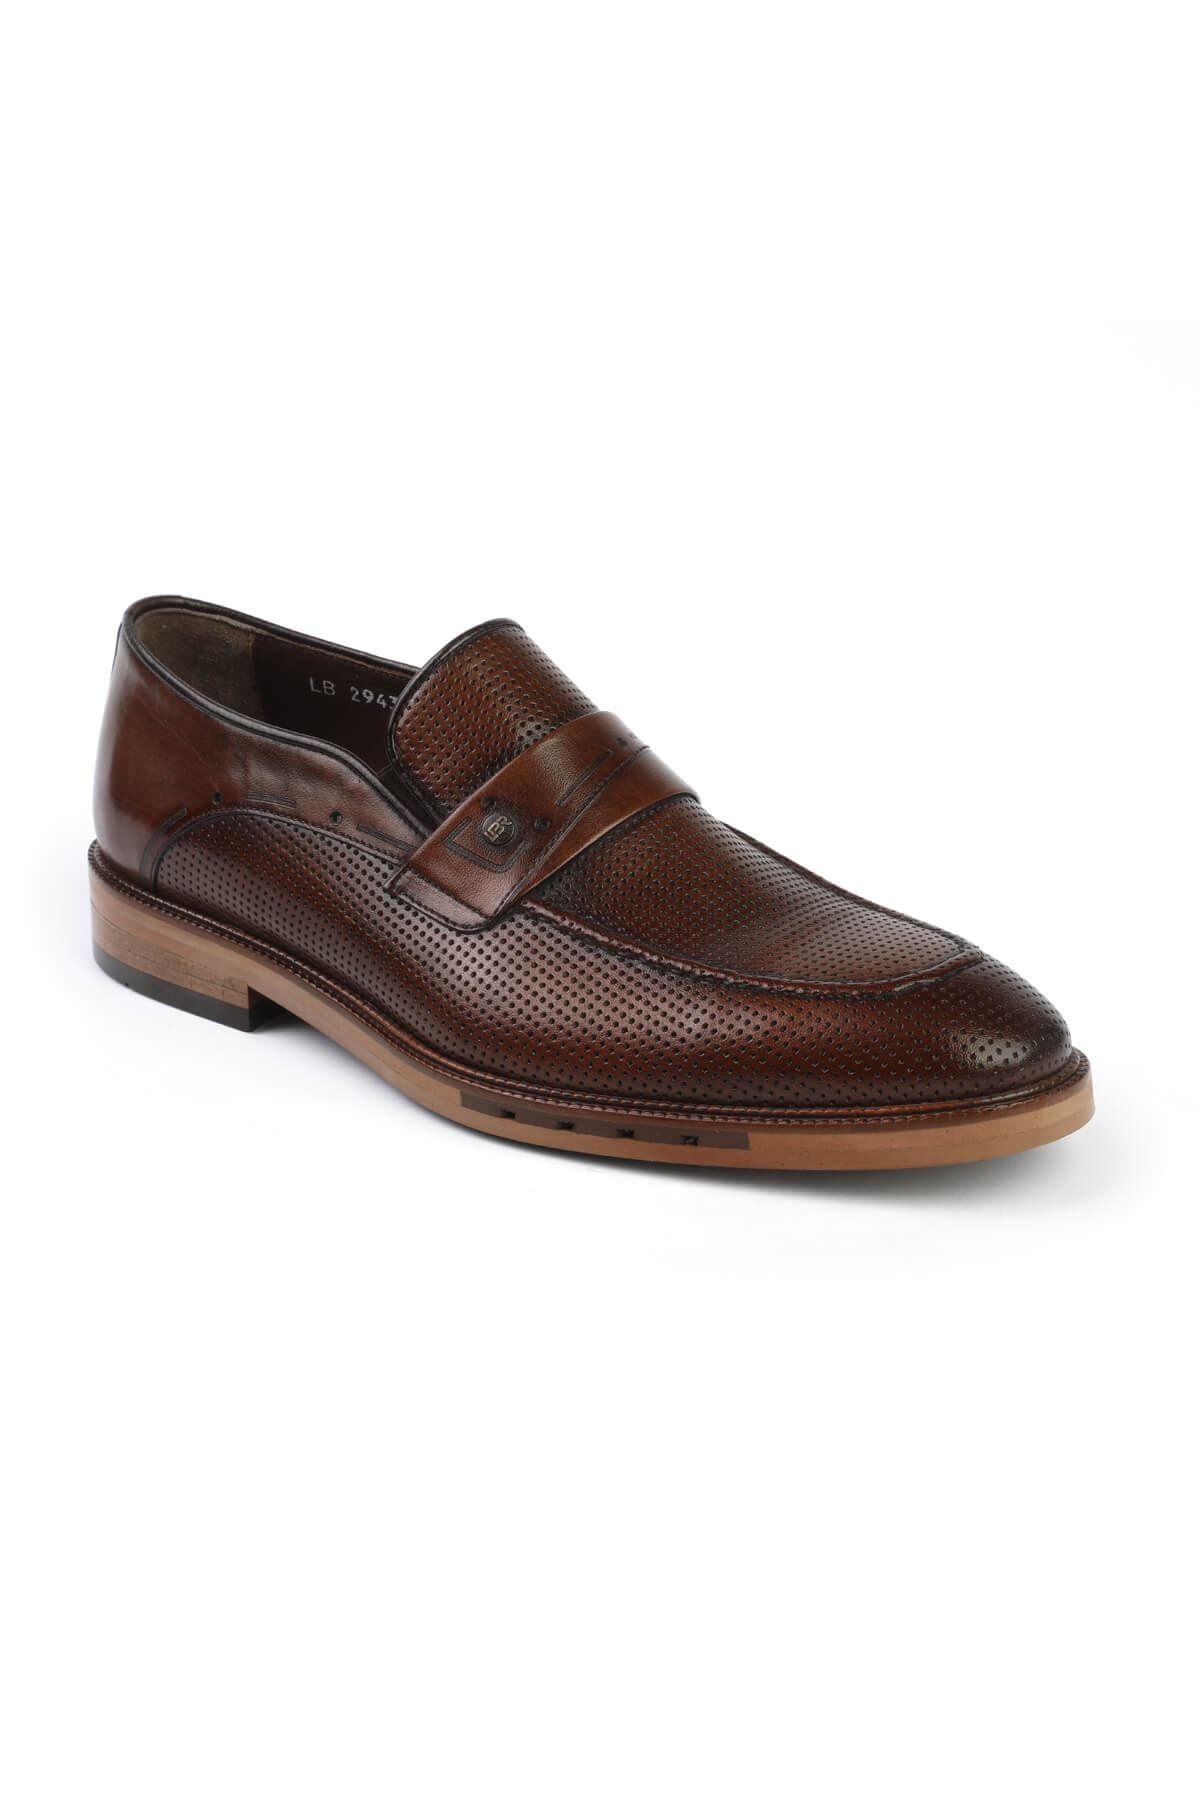 Libero 2943 Kahve Loafer Ayakkabı